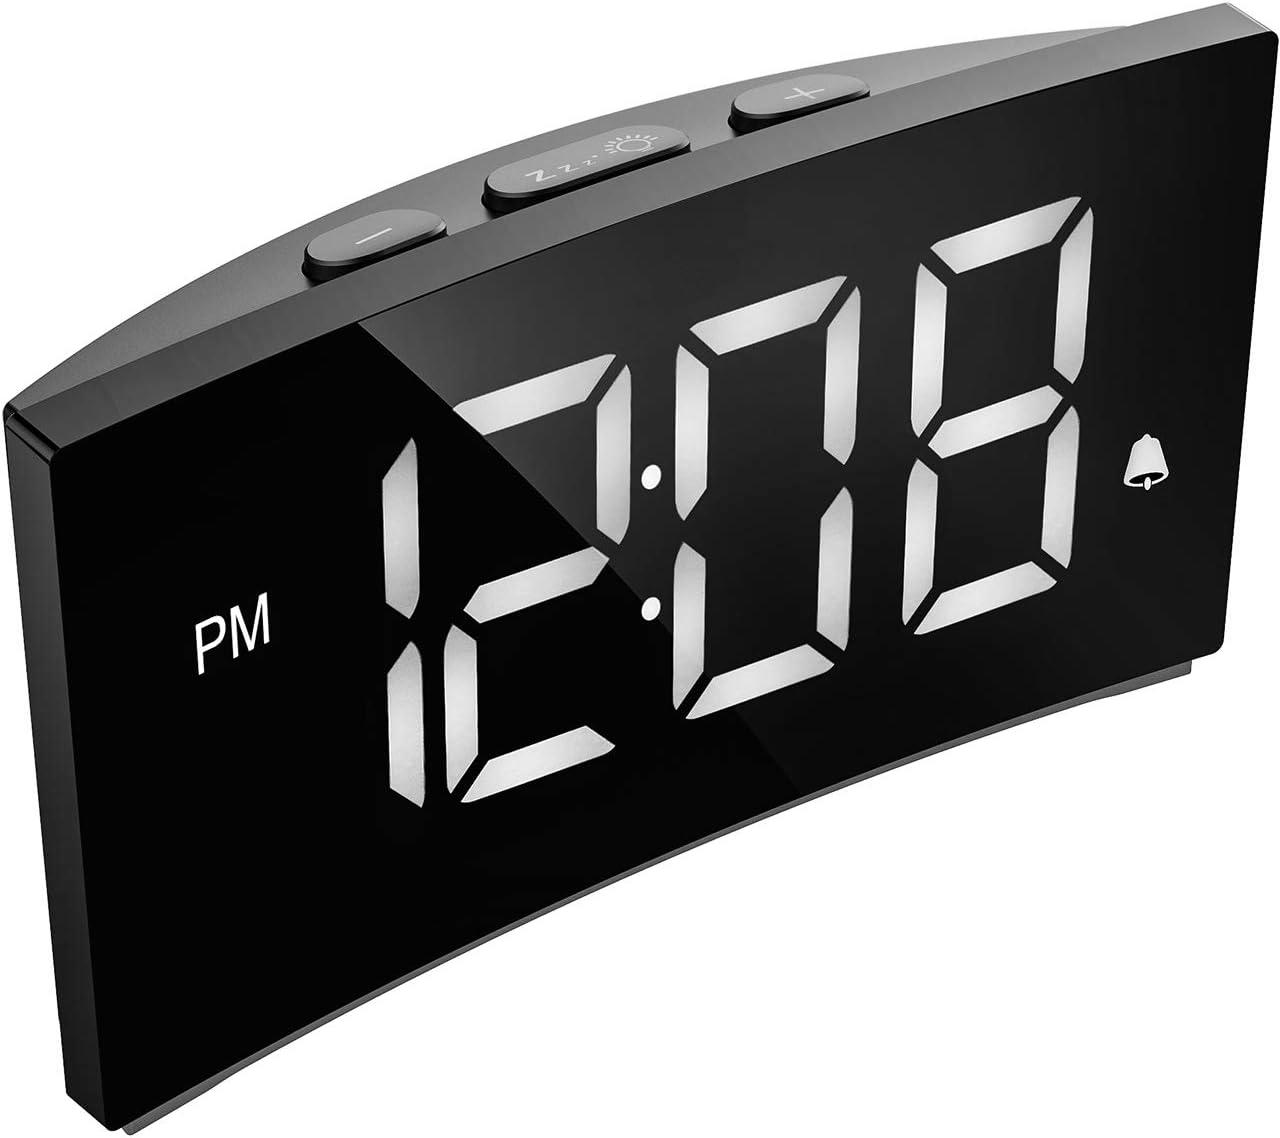 PICTEK Digital Alarm Clock, 5 Curved Dimmable LED Screen, Digital Clock for Kid Senior, Ultra-Clear White Large Number, 6 Brightness, Snooze, 12 24H, Alarm Clock for Bedroom Office NO Adapter